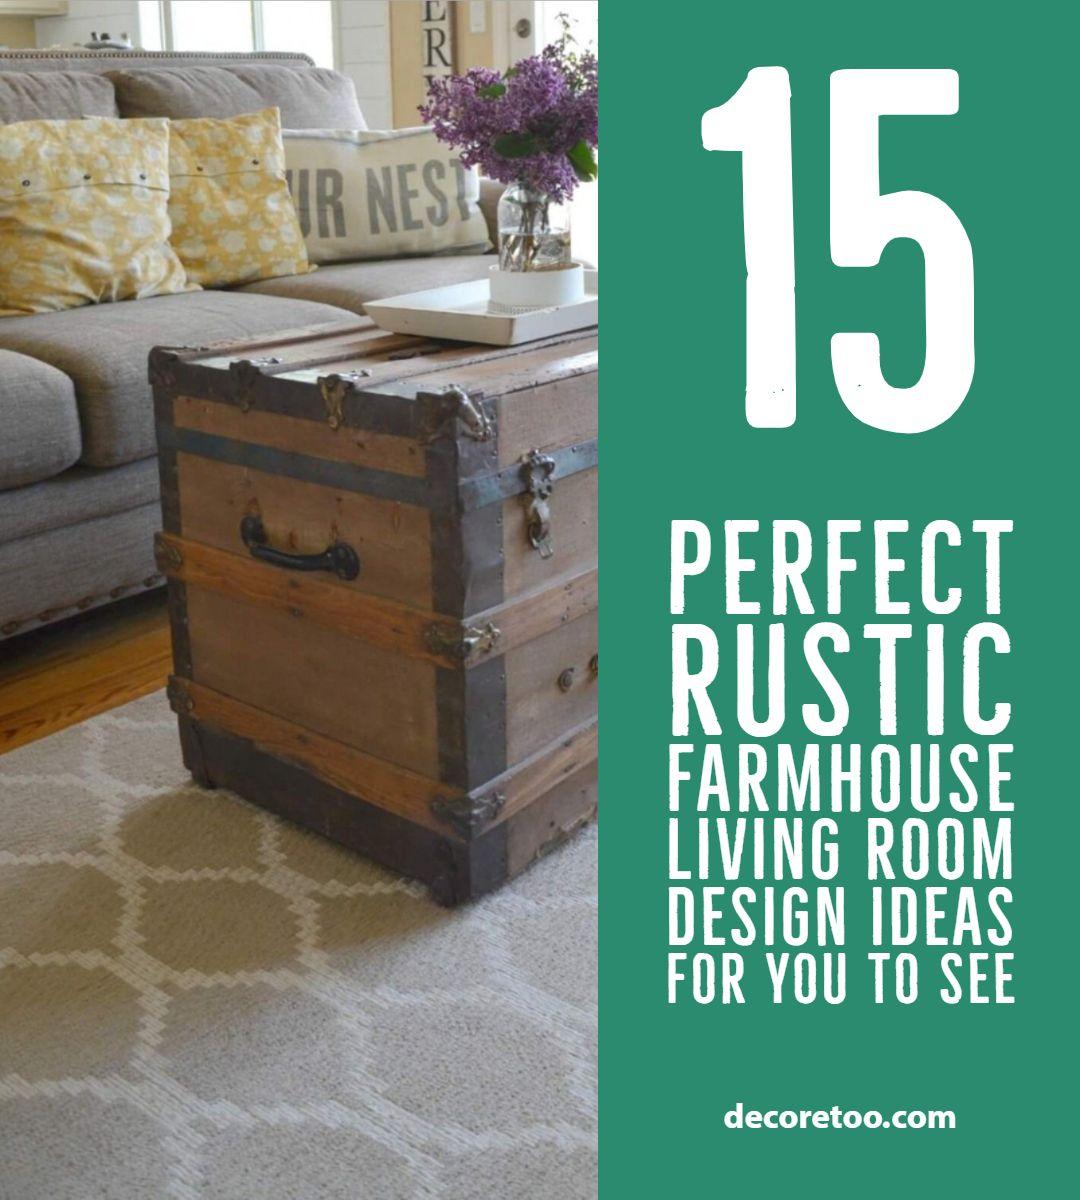 15 Perfect Rustic Farmhouse Living Room Design Ideas For